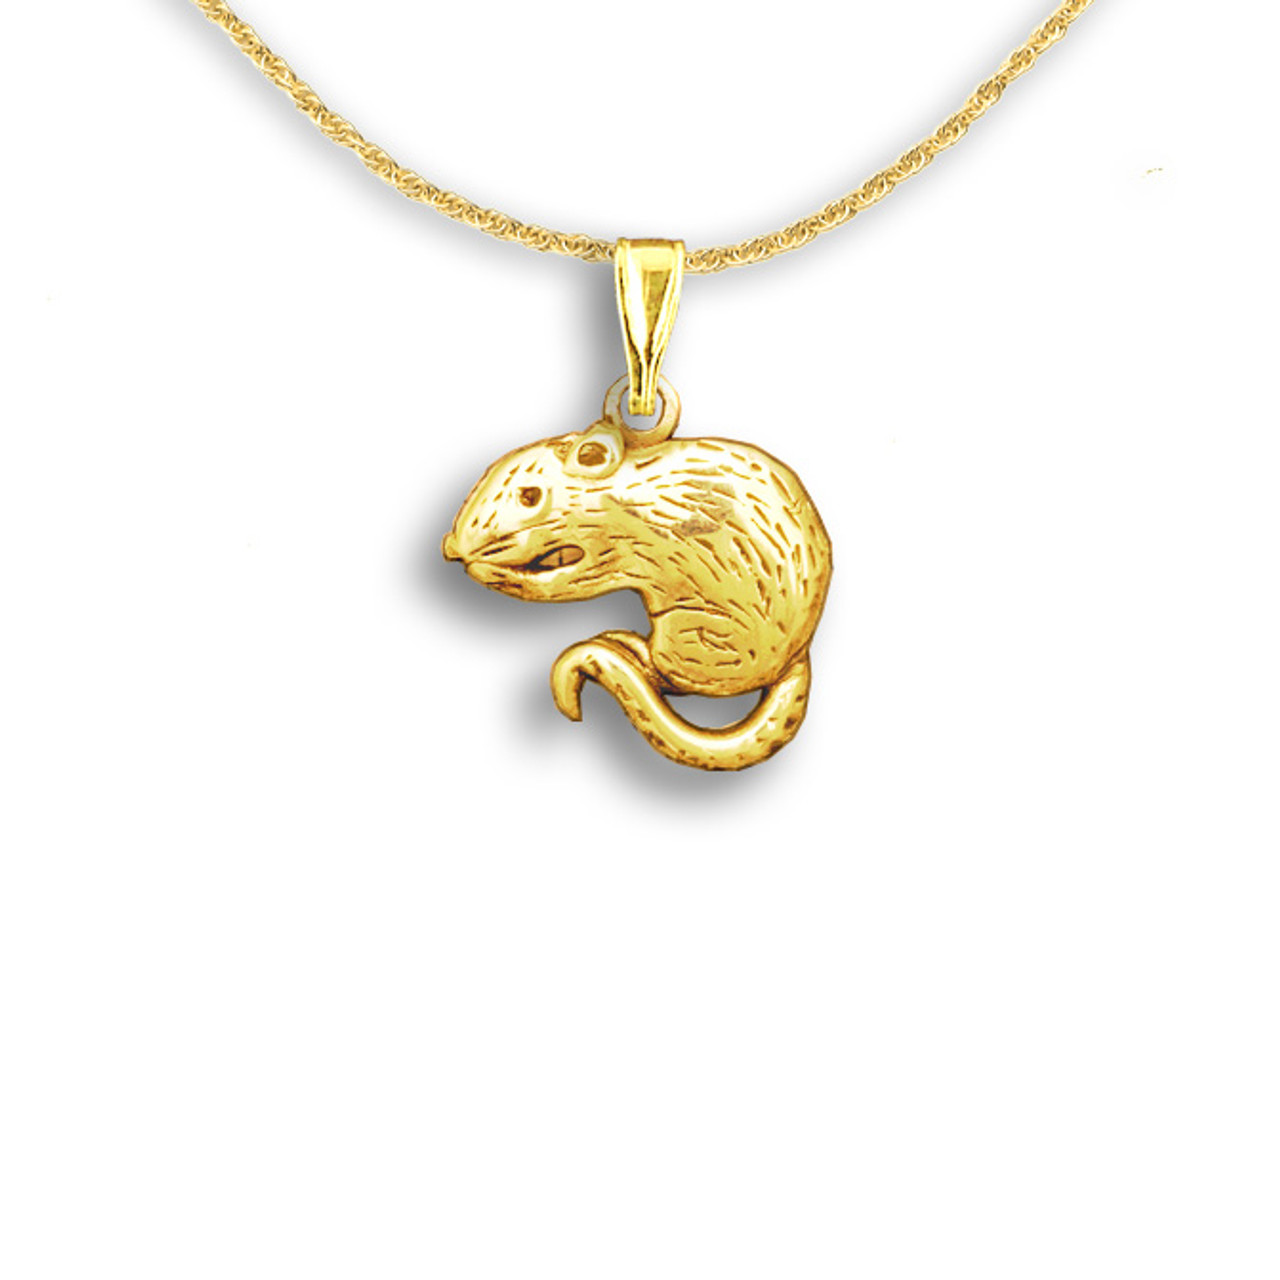 Rat pendant Pocket pet jewelry Rodent necklace